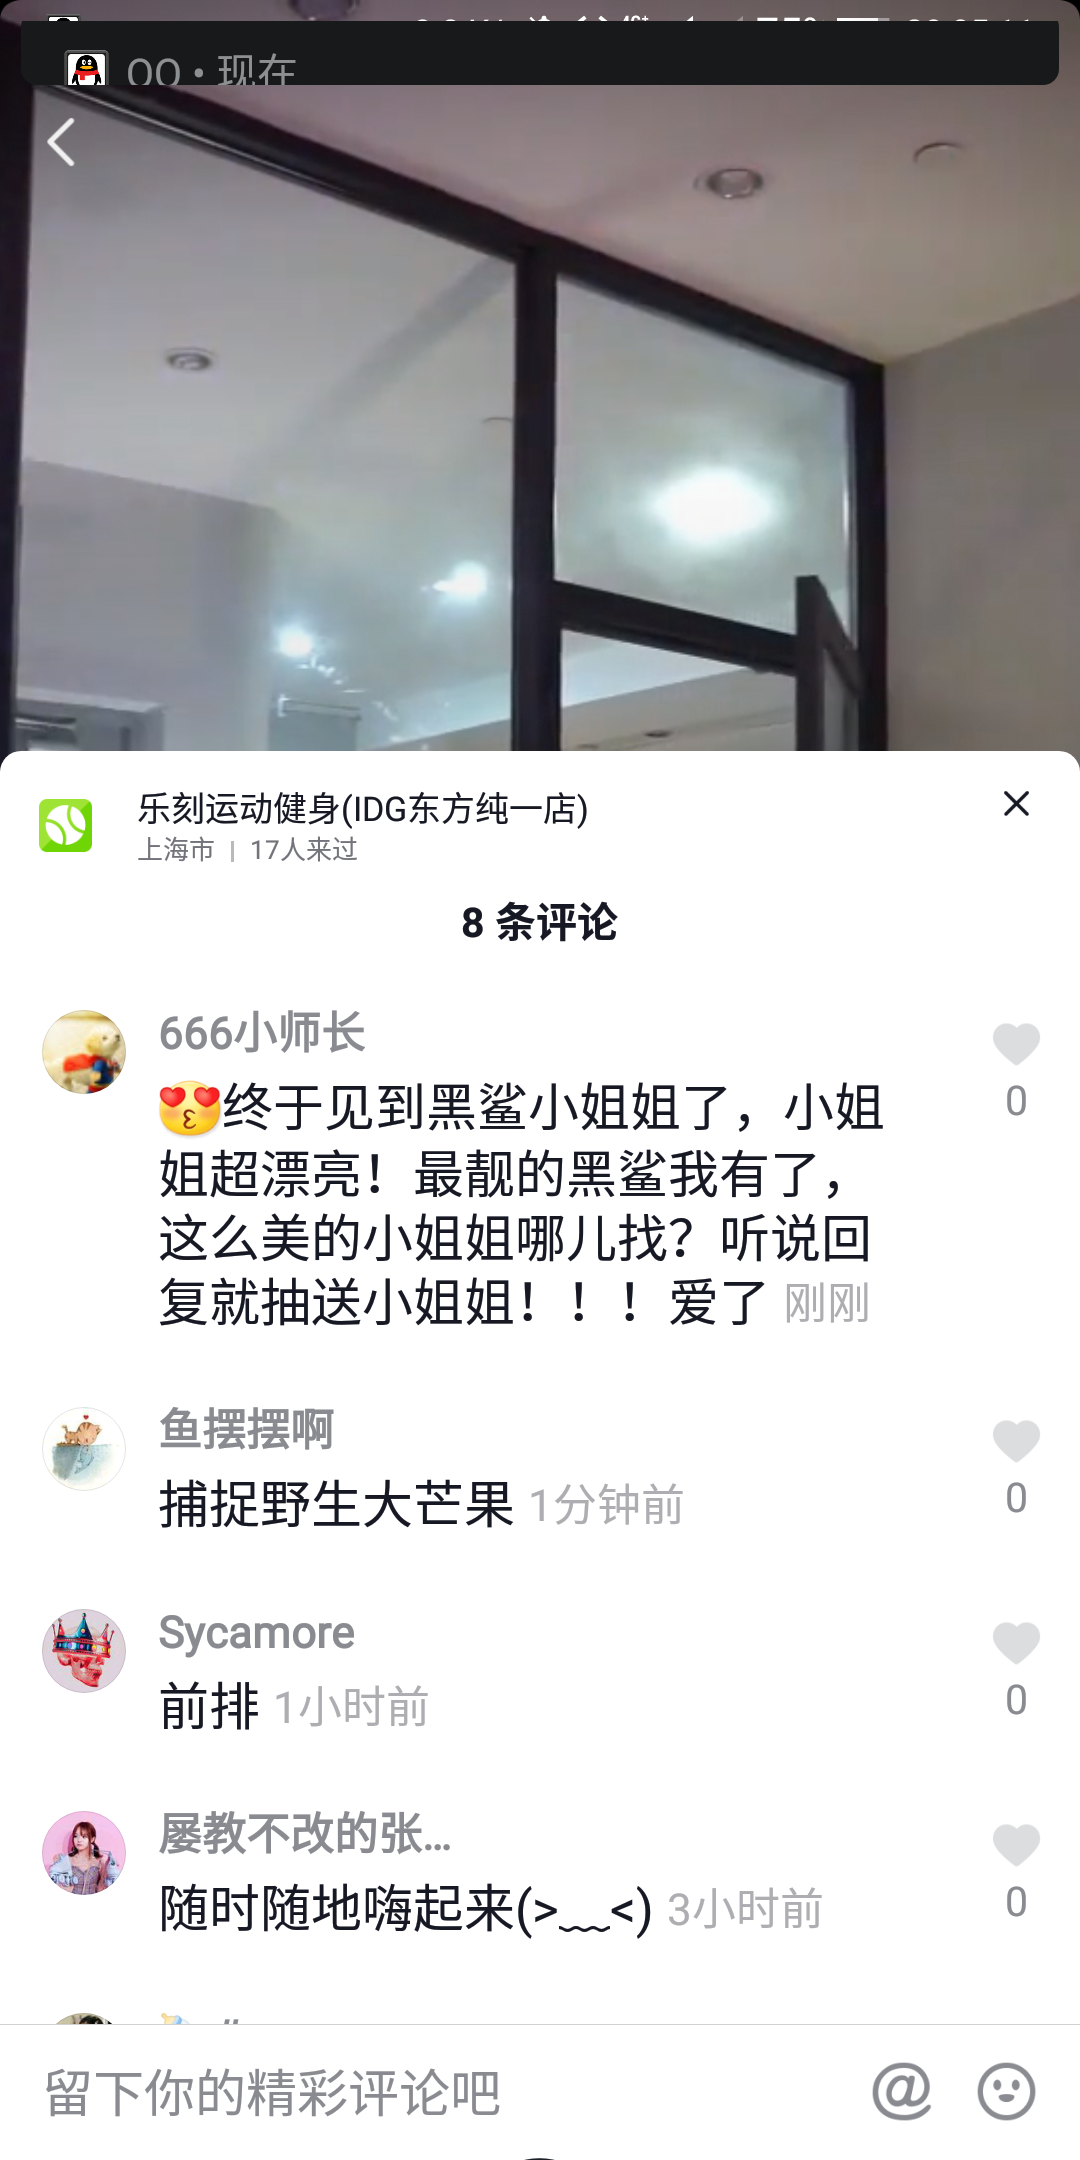 Screenshot_2019-05-14-20-05-12-773_com.ss.android.ugc.aweme.png